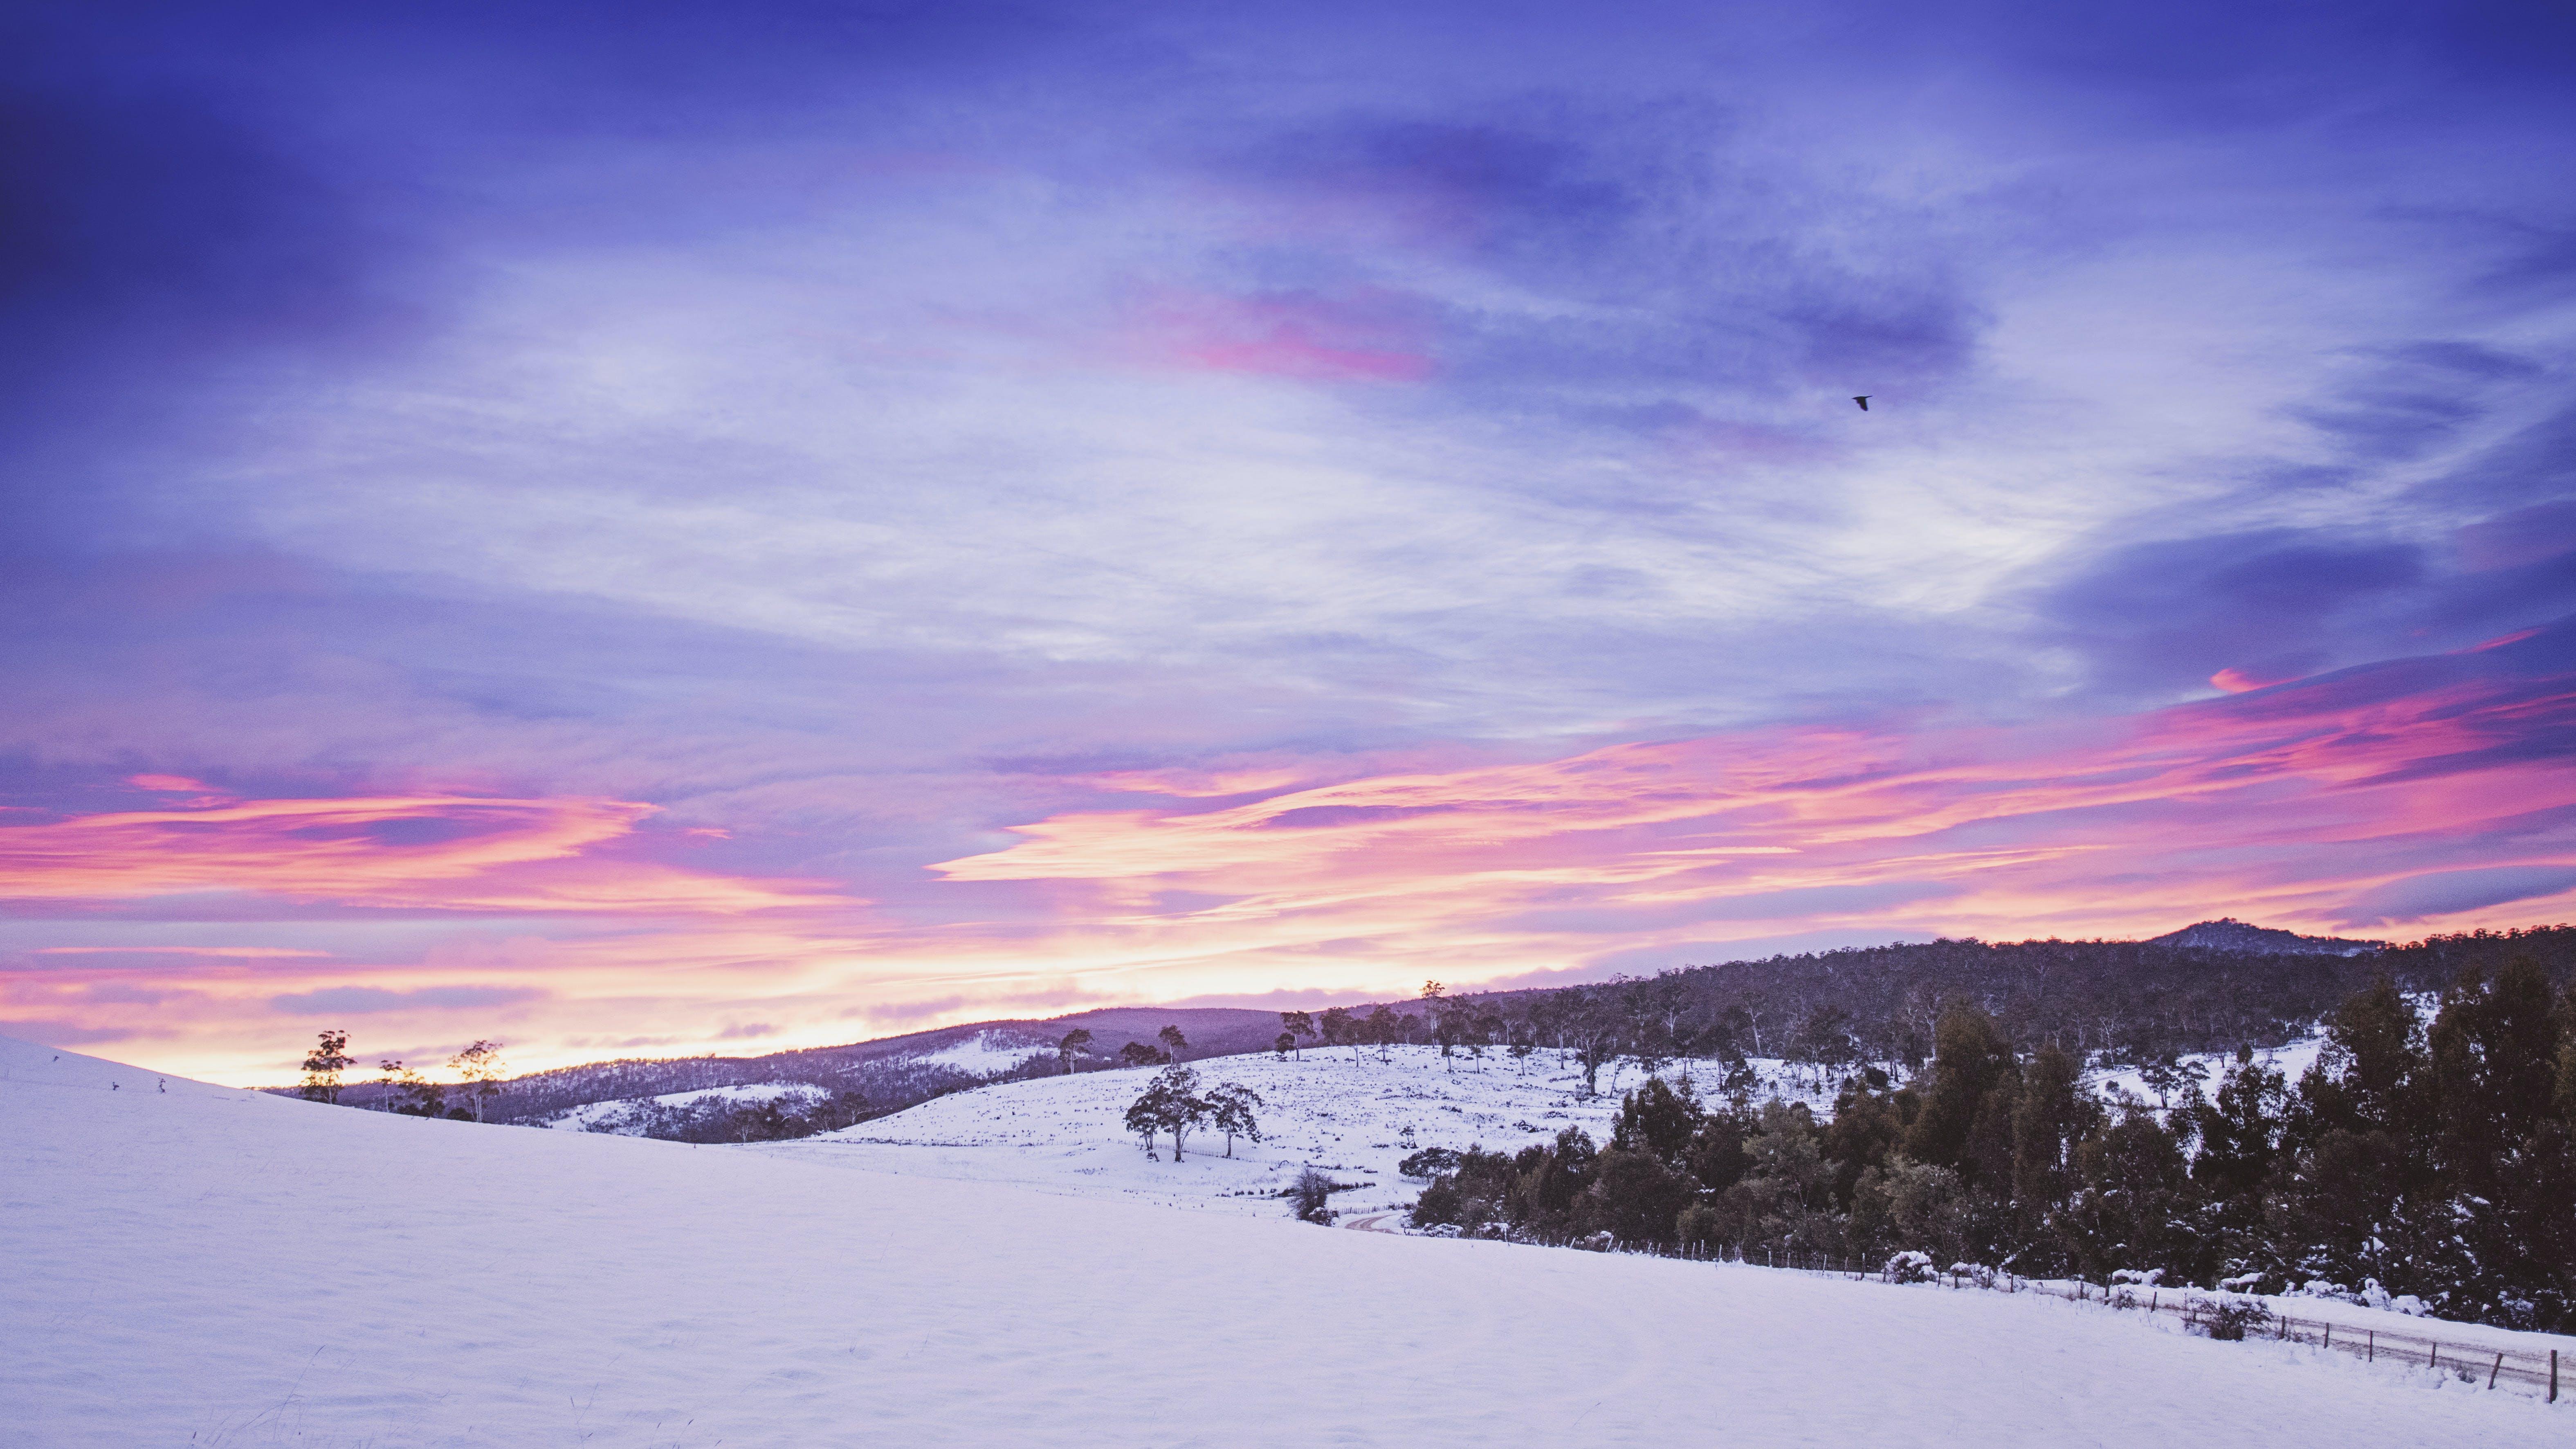 Orange Sunset and Snow Field